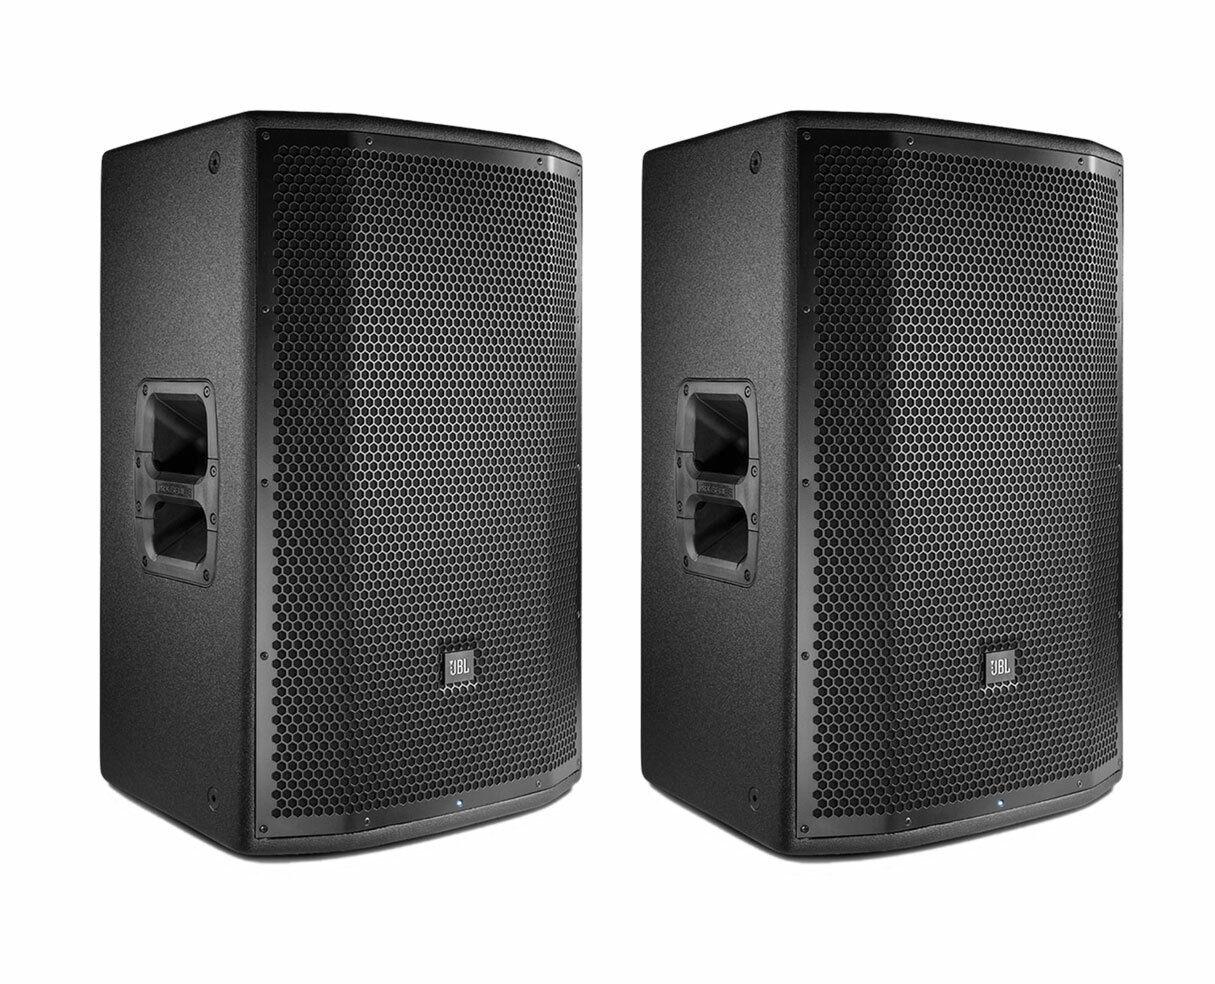 2x JBL PRX815W Active Loudspeaker Powered Monitor Speaker Pair. Buy it now for 1339.98